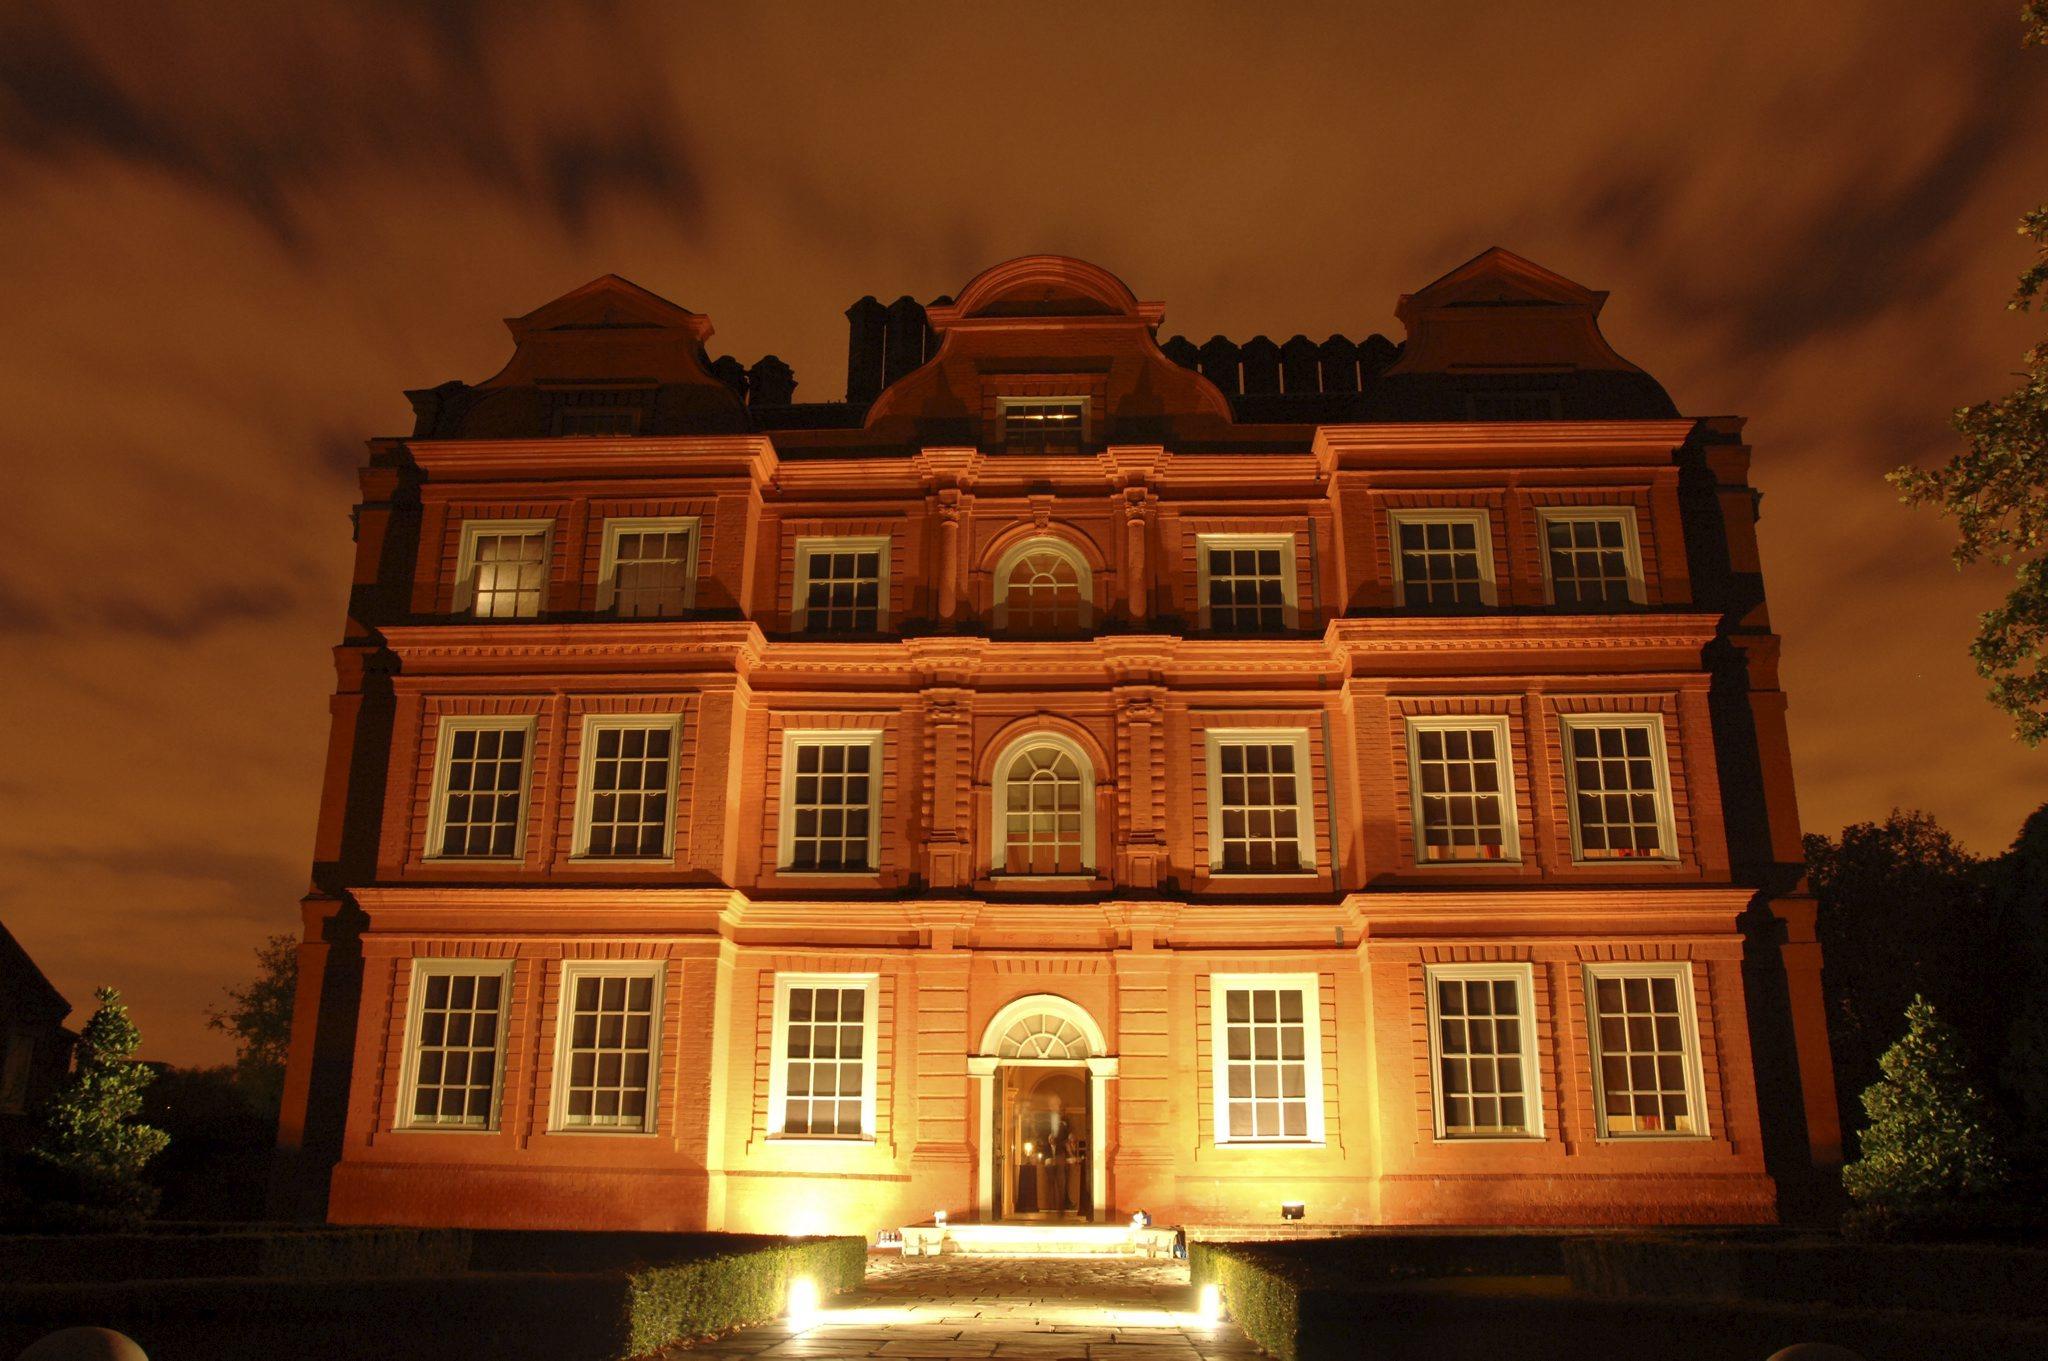 commercial - historic royal palaces - kew palace - curious kew